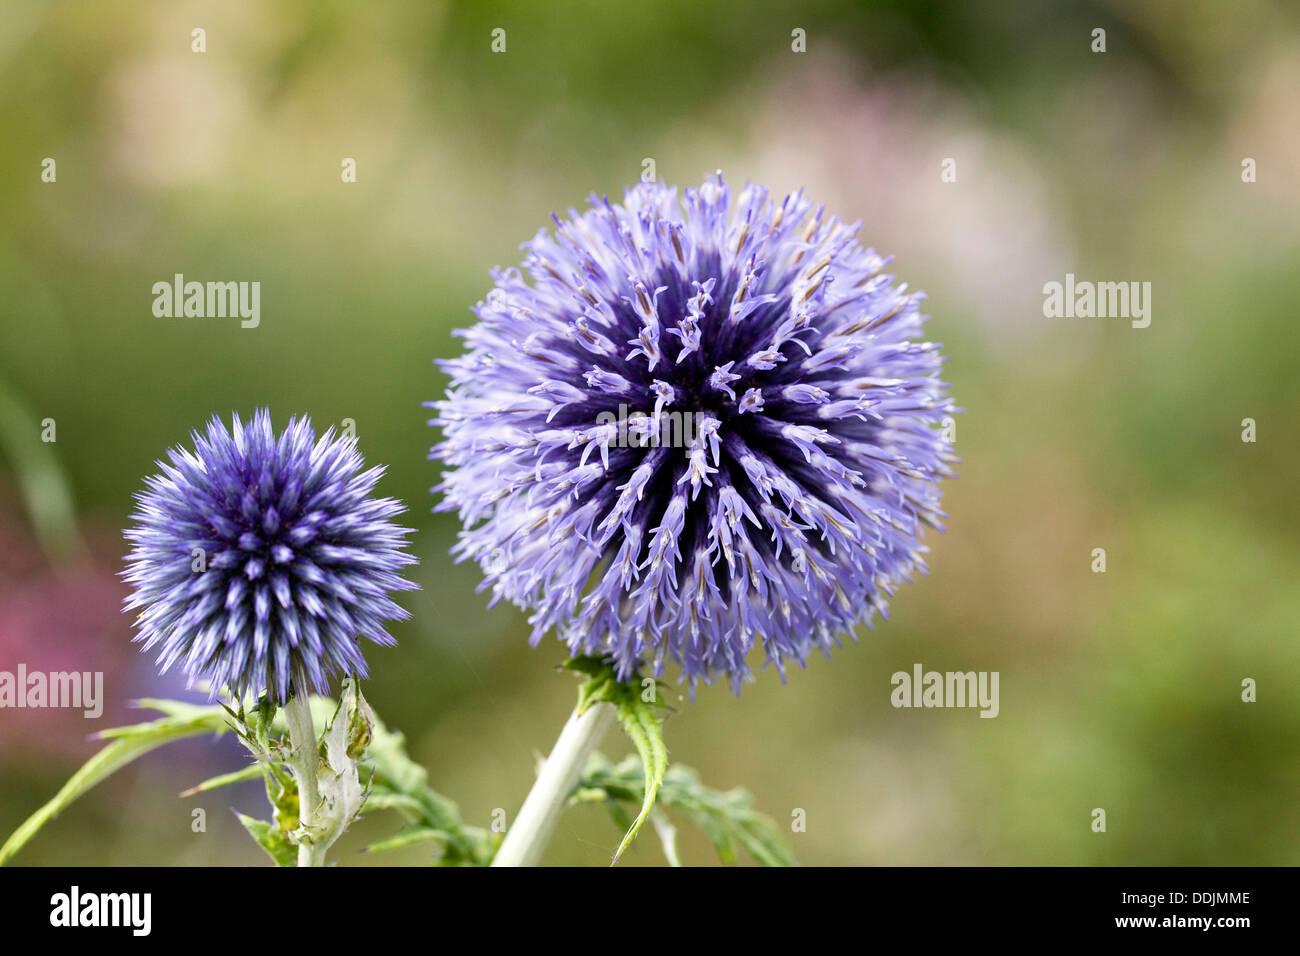 Trachycarpus fortunei 'Taplow Blue'. Globe thistle flower. Photo Stock